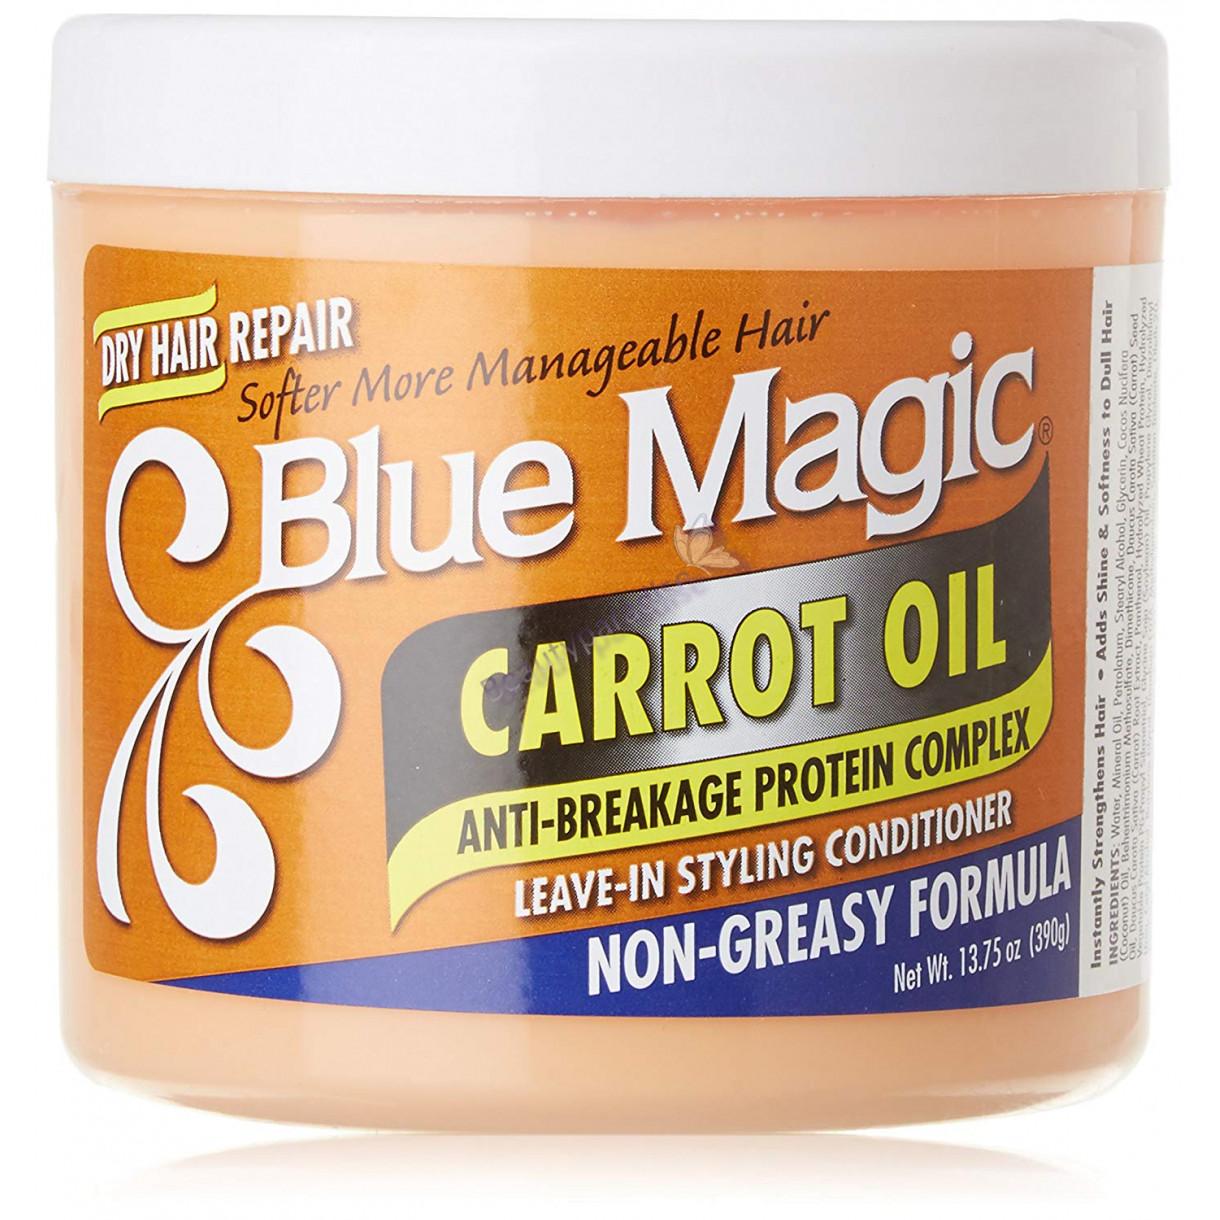 blue magic carrot